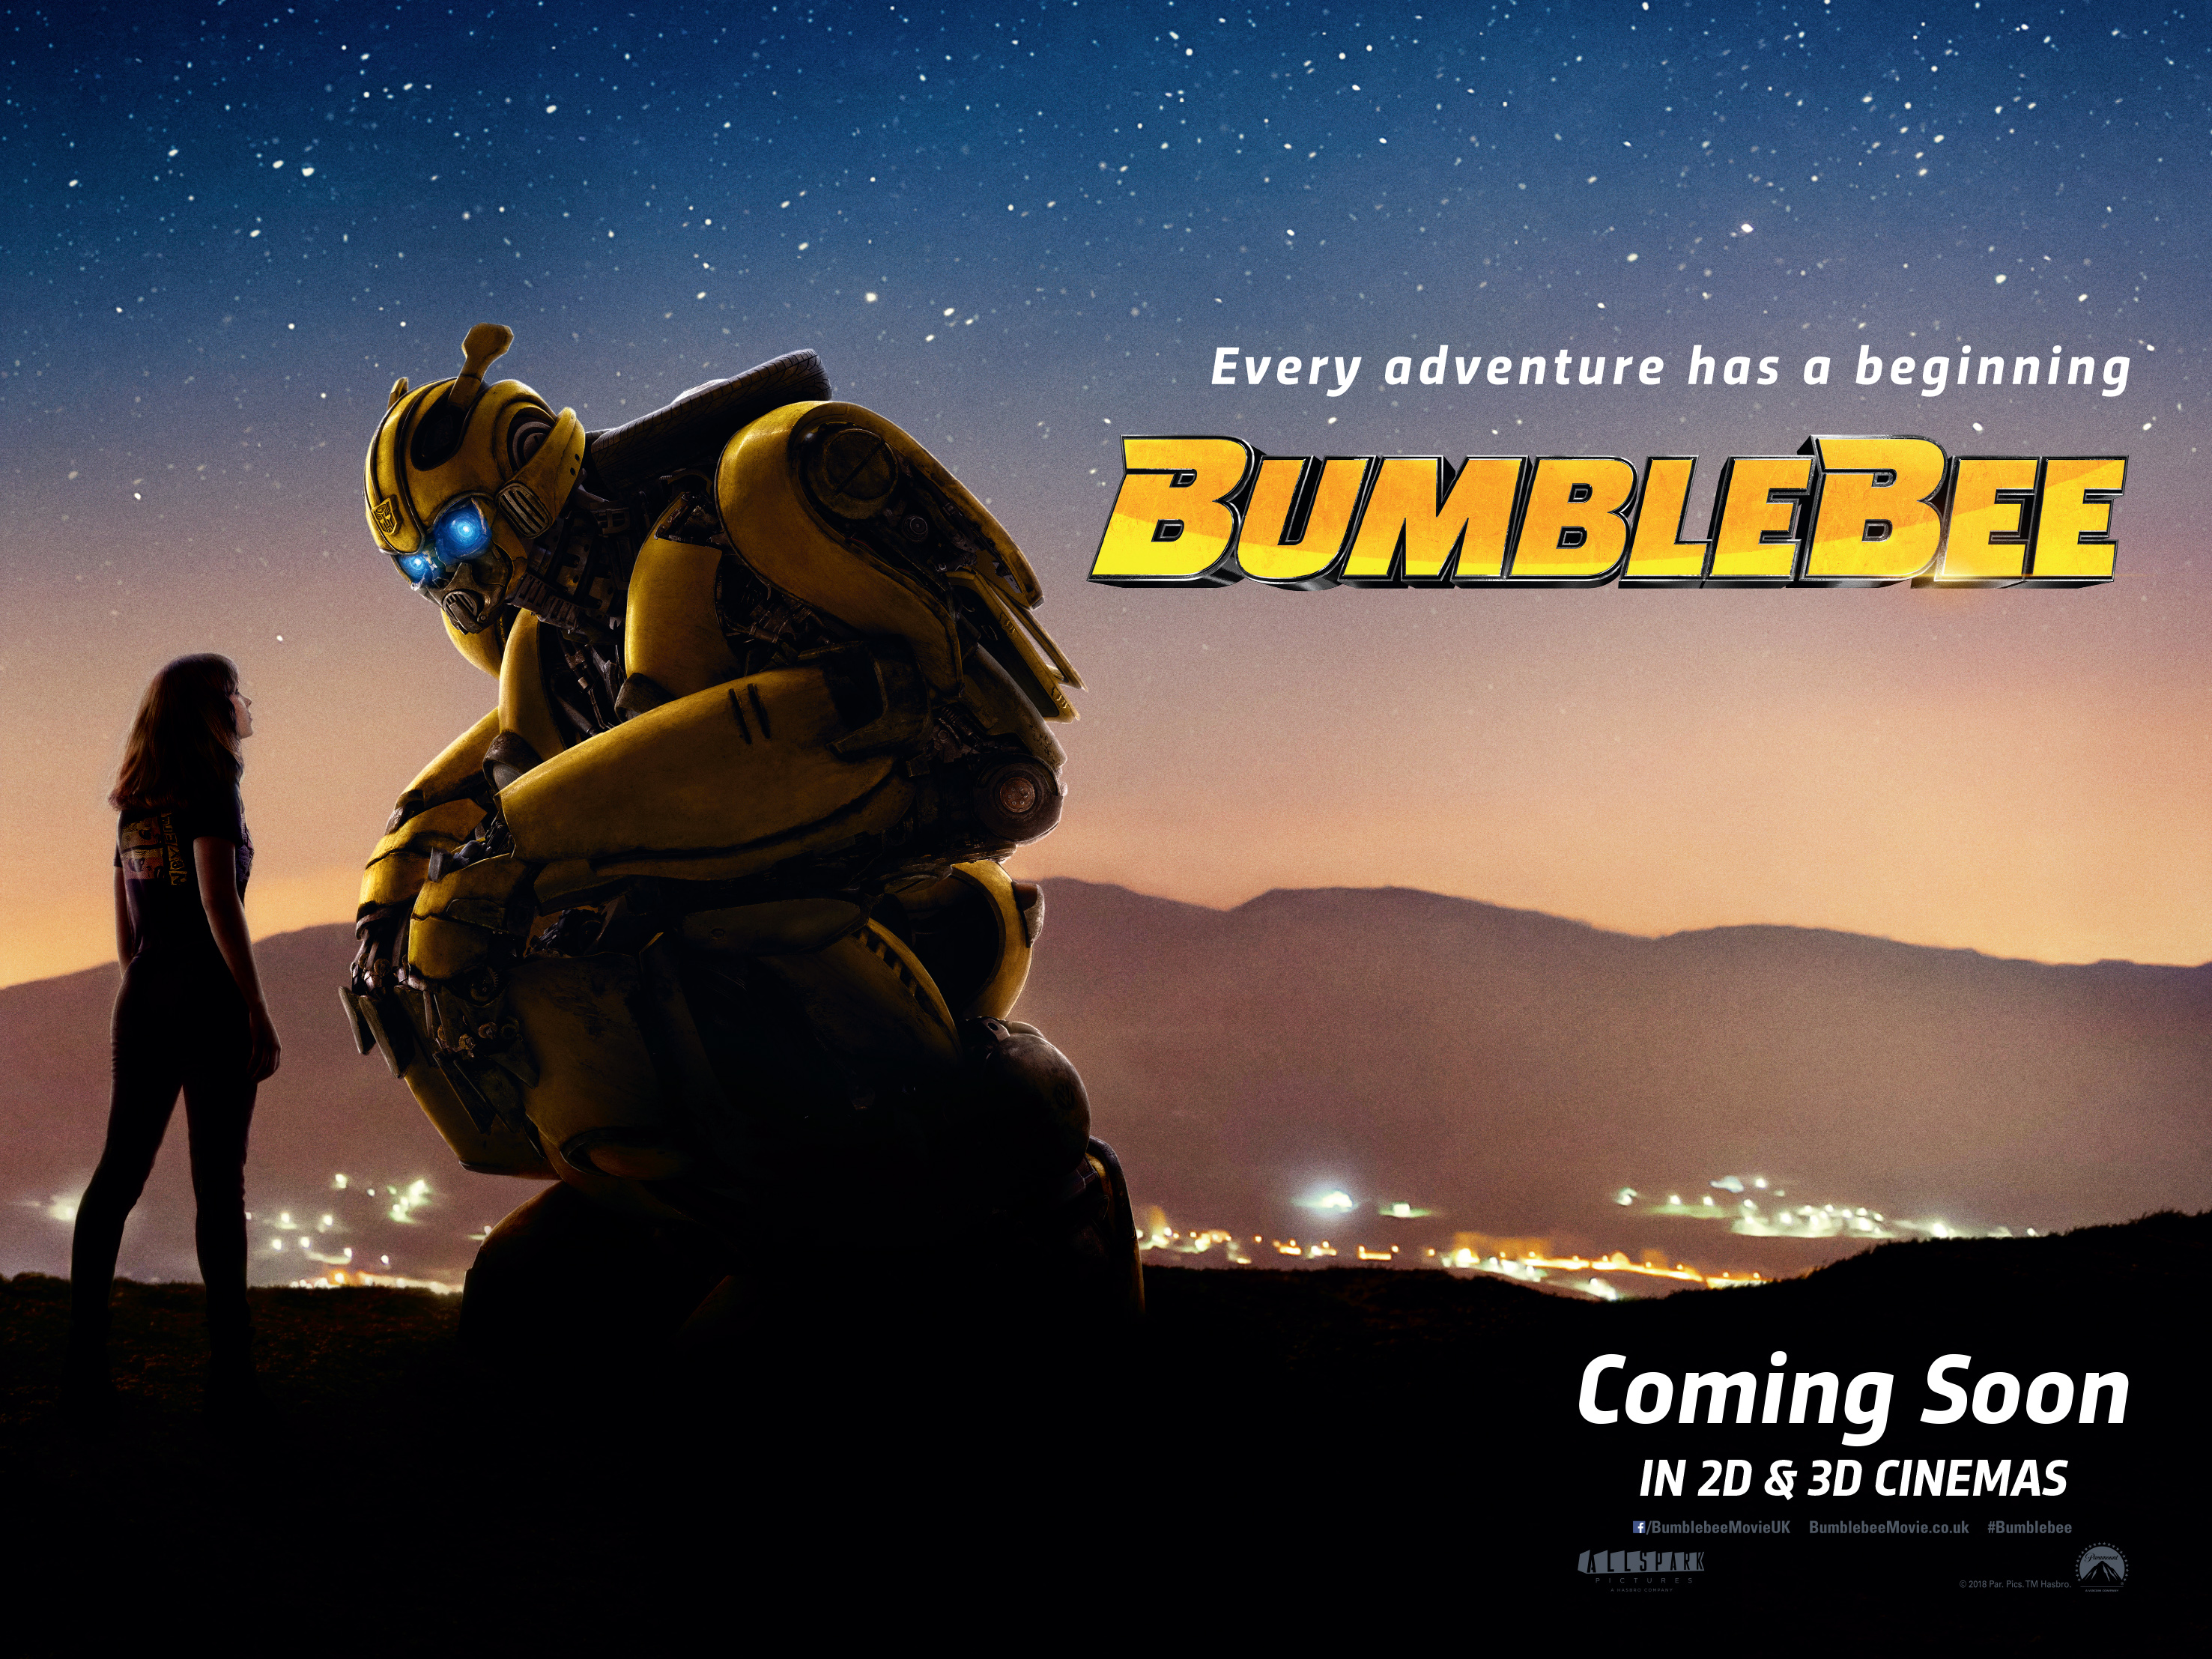 bumbleb coming soon trailers - HD2953×2215